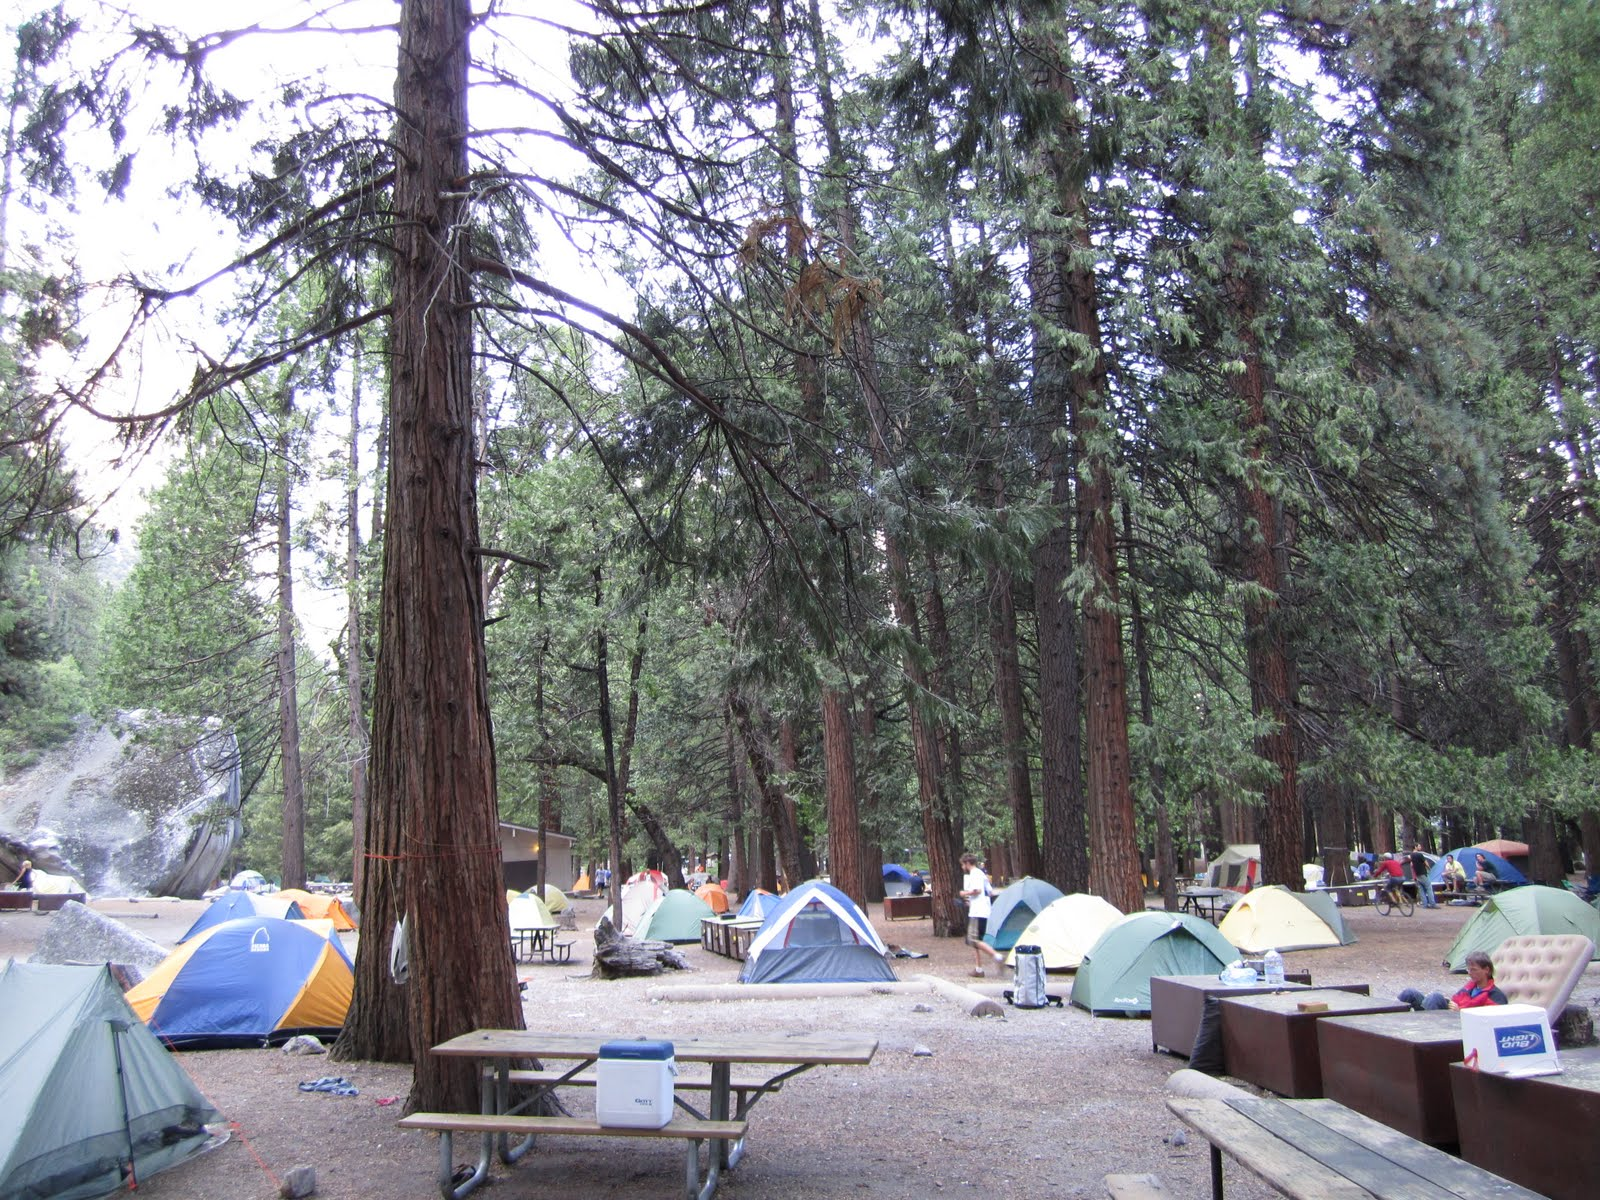 Camping   Yosemite Climbing Information Yosemite Climbing 1600x1200